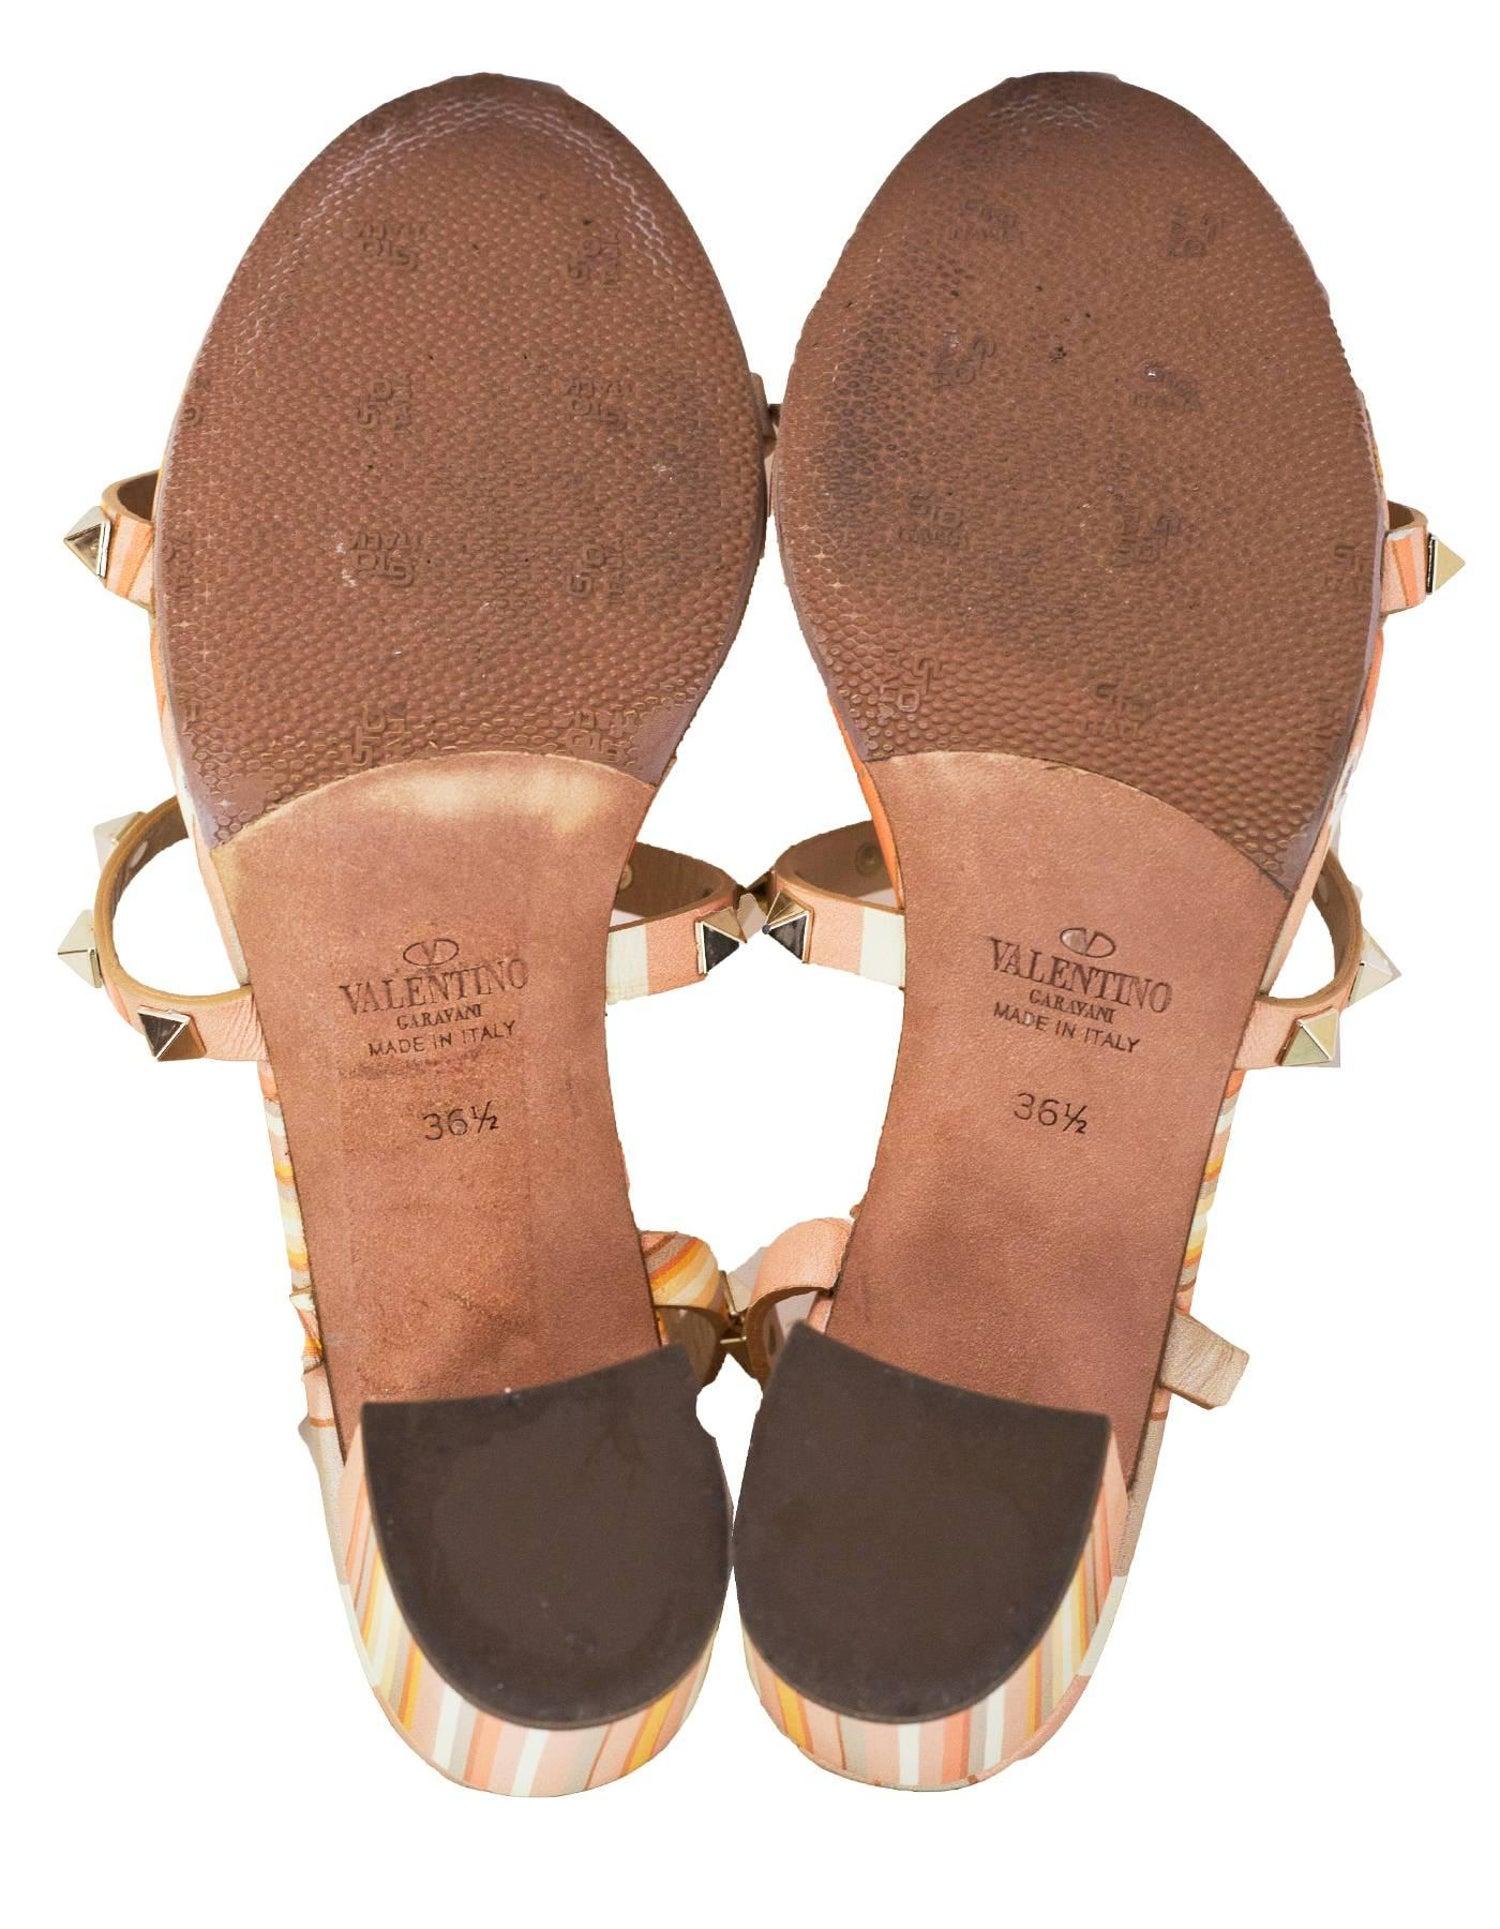 f69557fba5 Valentino Orange Rockstud Navajo Print 60mm Caged Sandals Sz 36.5 For Sale  at 1stdibs